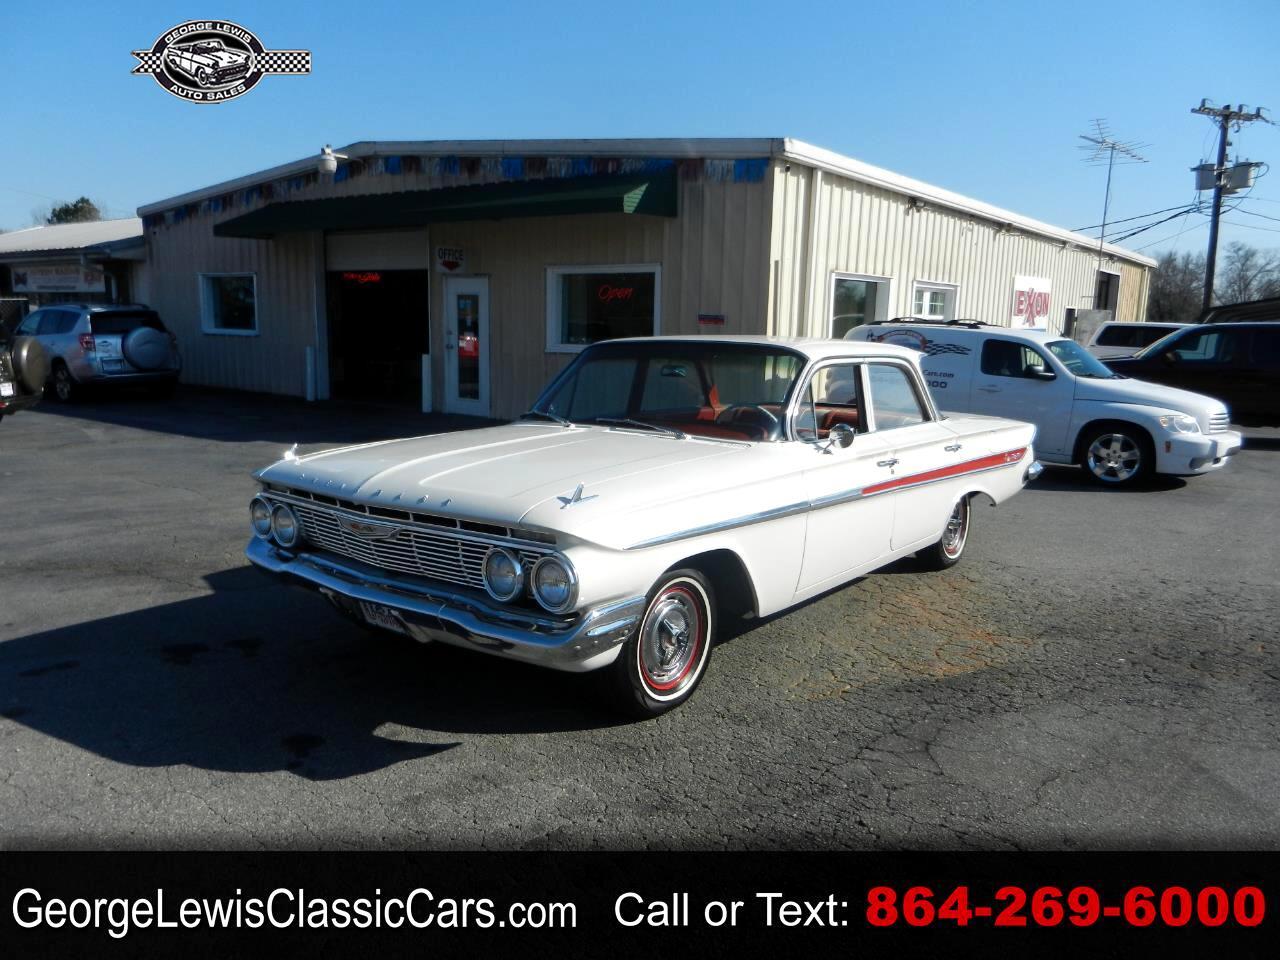 Chevrolet Impala 4dr Sdn 1961